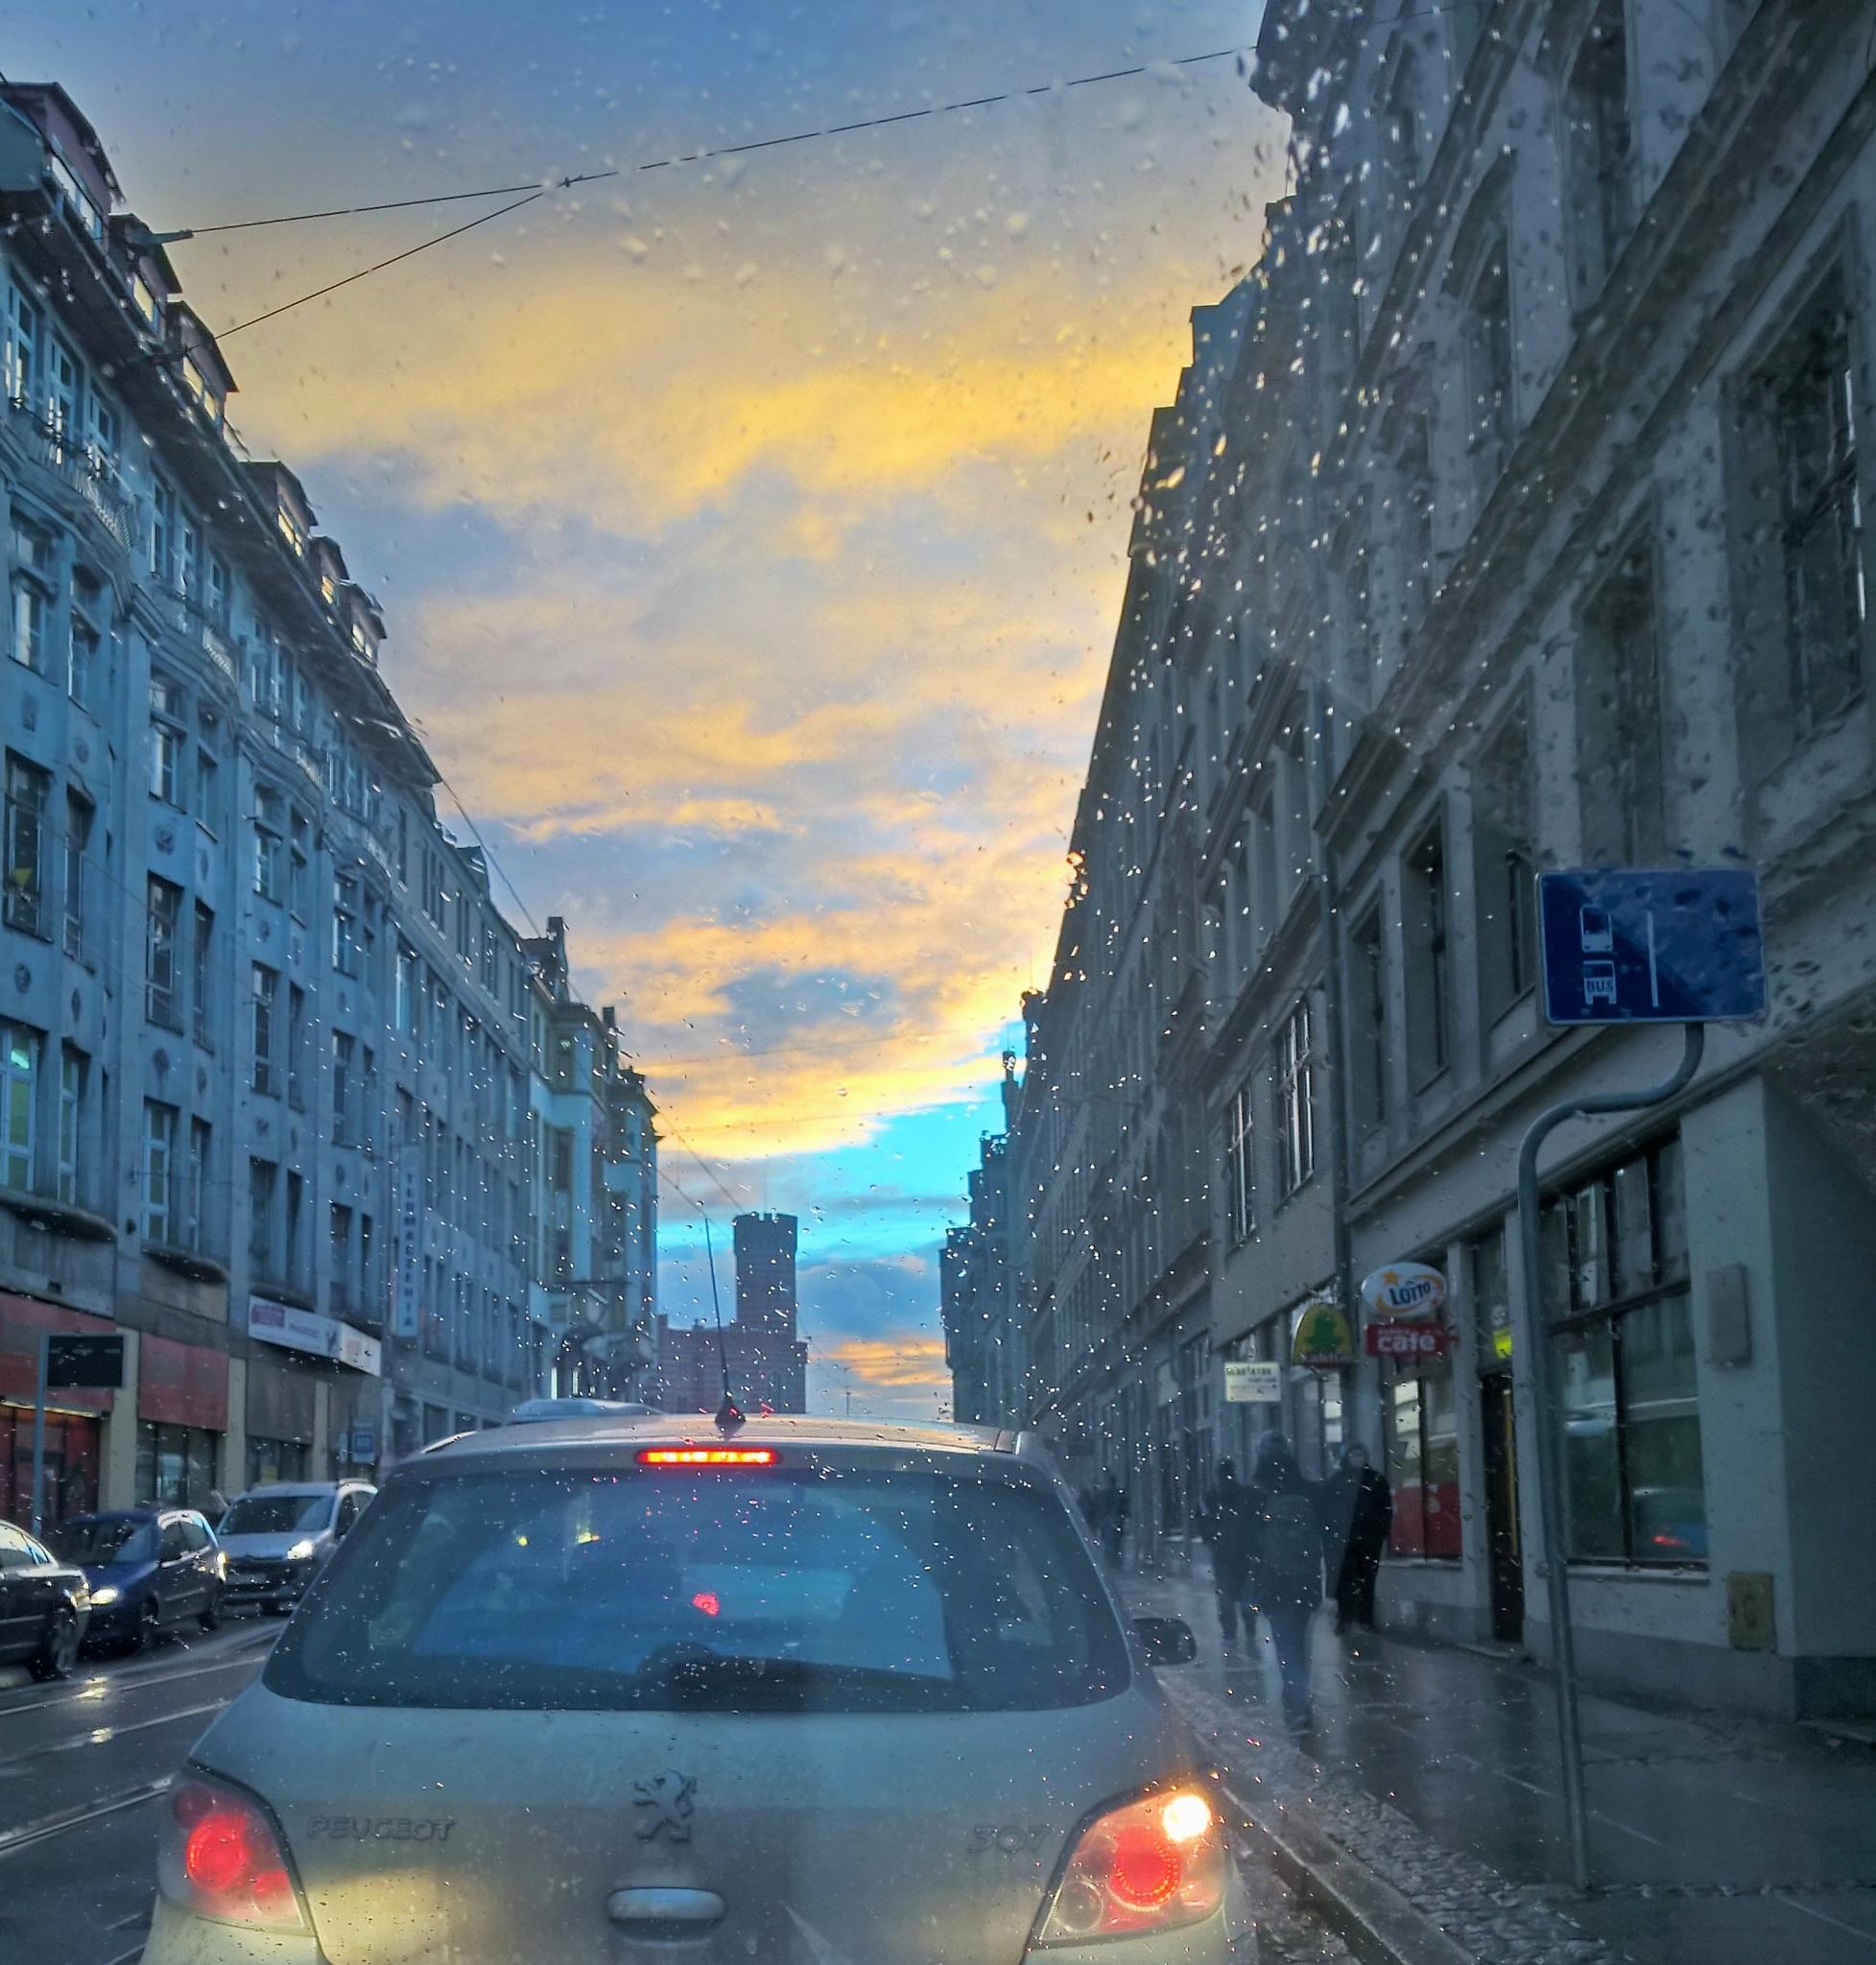 in traffic jam  by Robert Jurczyk